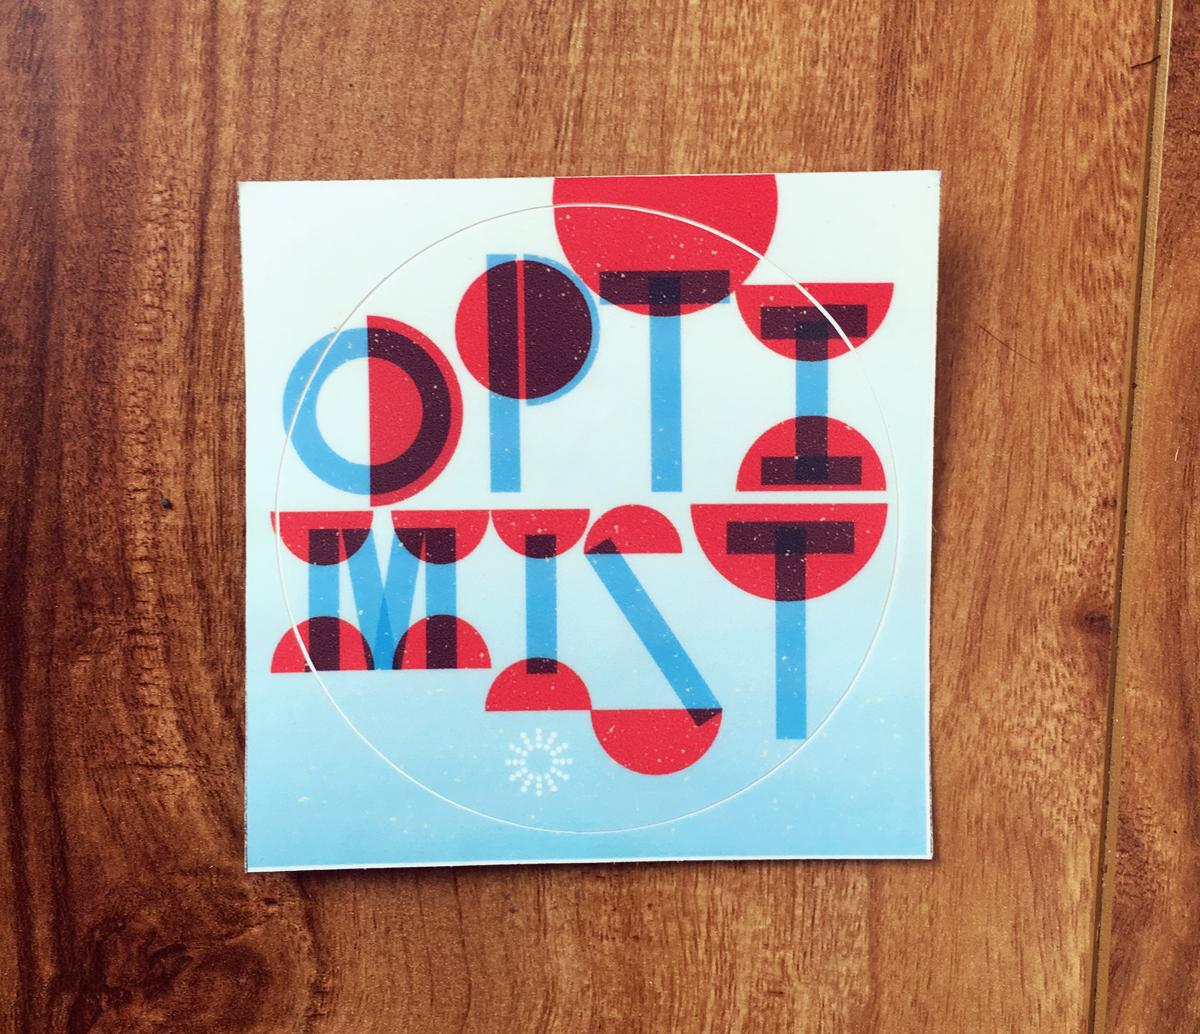 Optimist-sticker-IRL-1.png